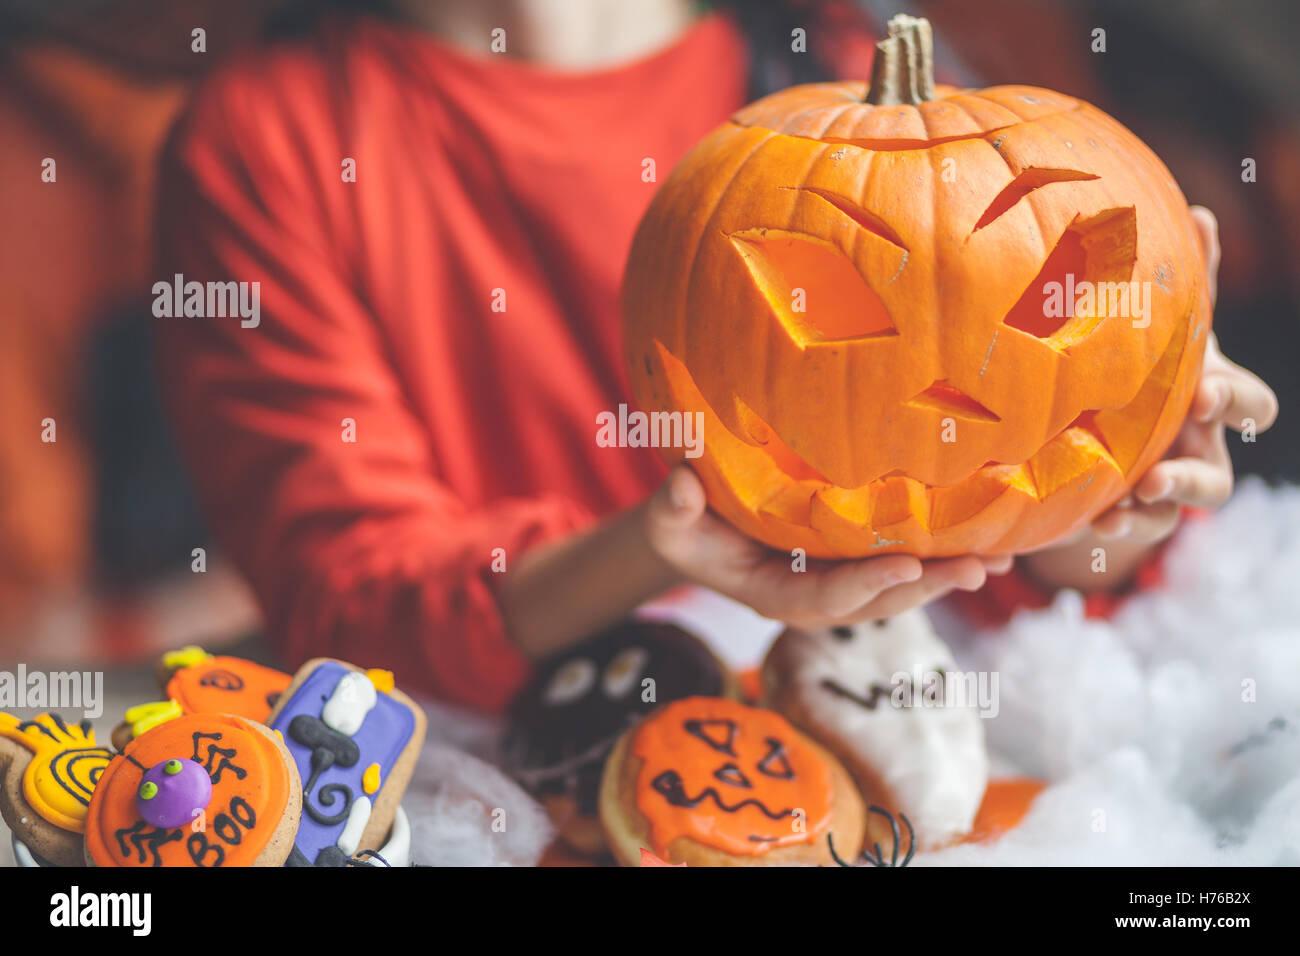 Boy holding a jack-o-lantern halloween pumpkin - Stock Image